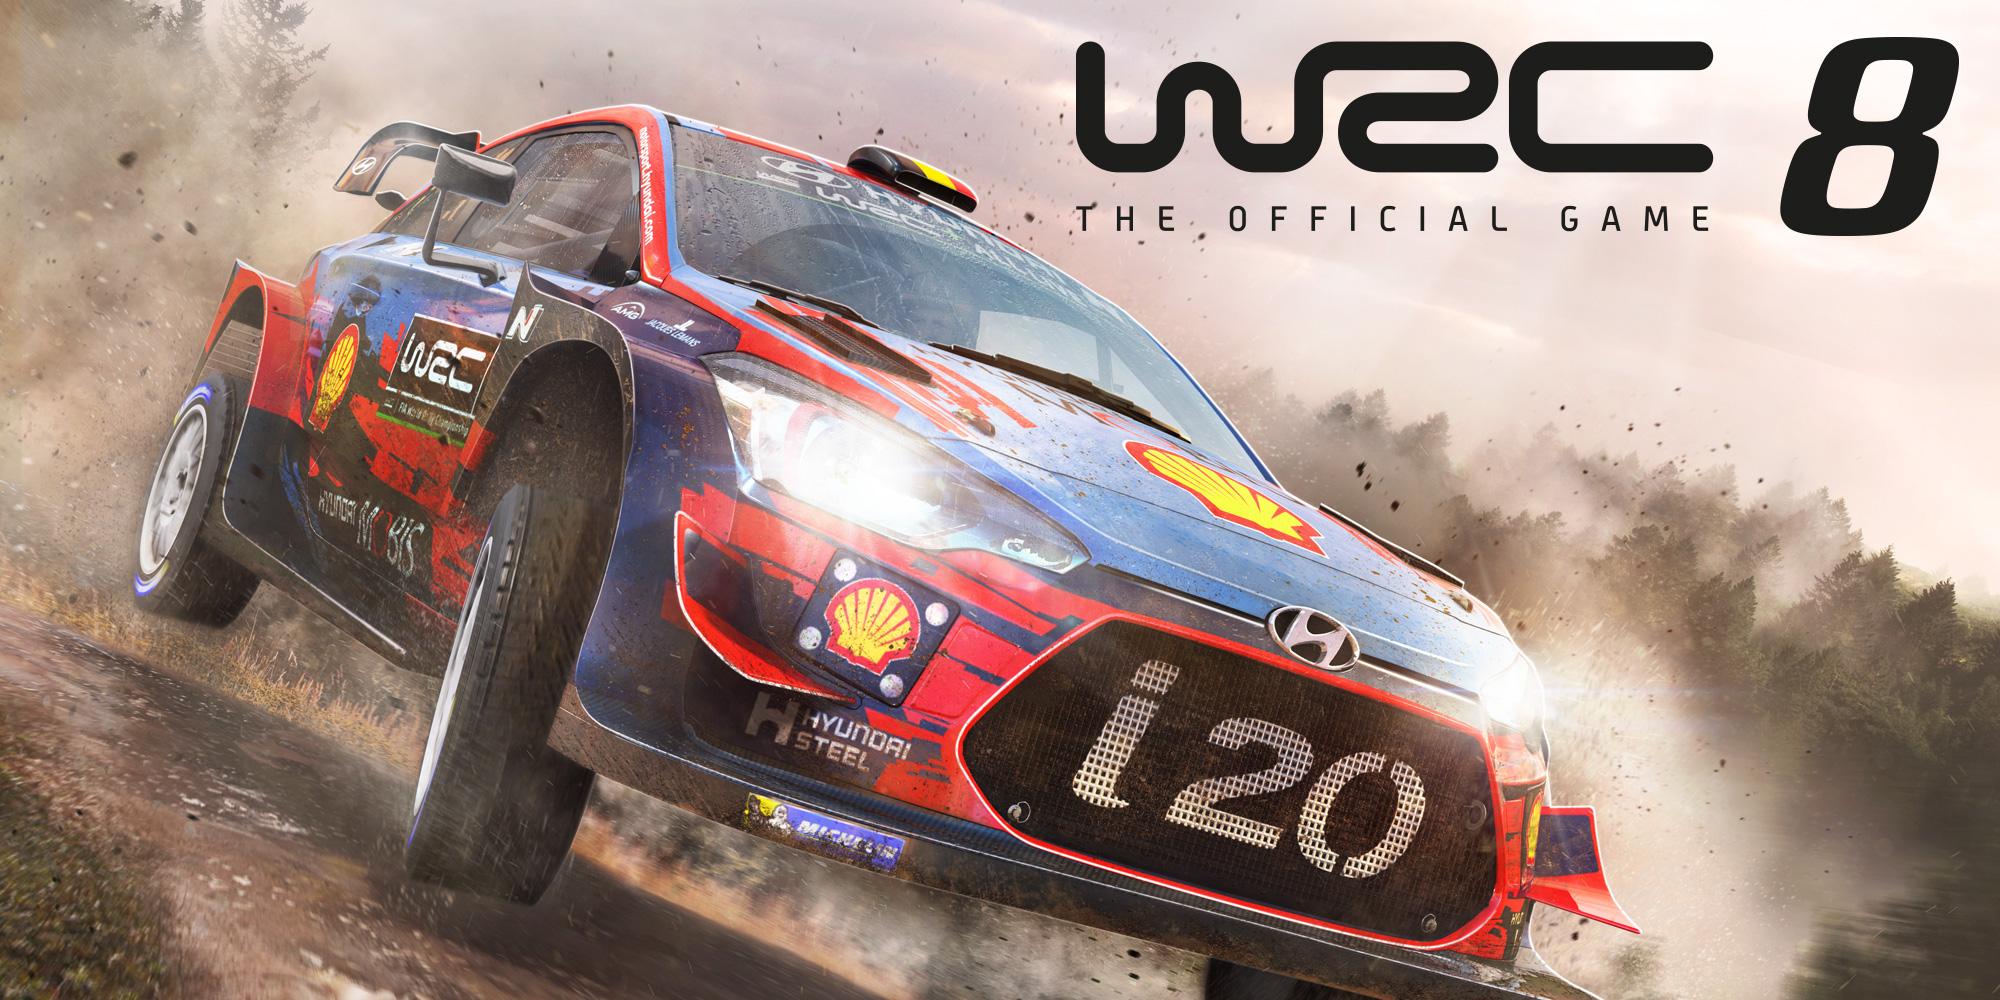 Fanatec and World Rally Championships (WRC) enters multi-year partnership